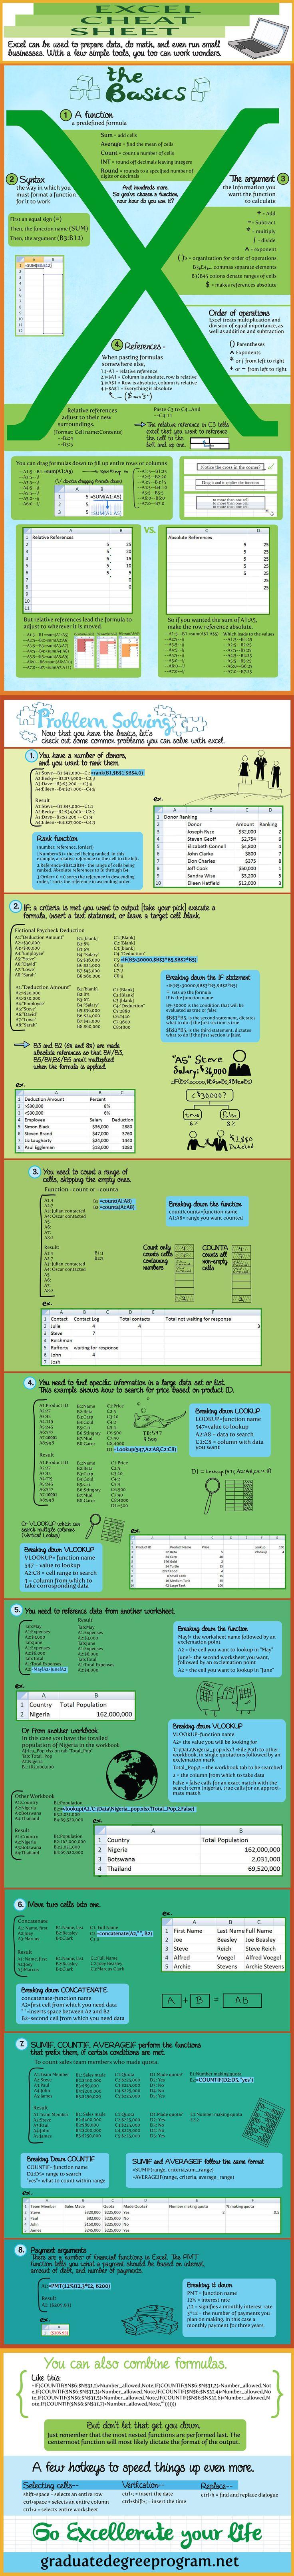 Excel Cheat http://graduatedegreeprogram.net/excel-cheats/